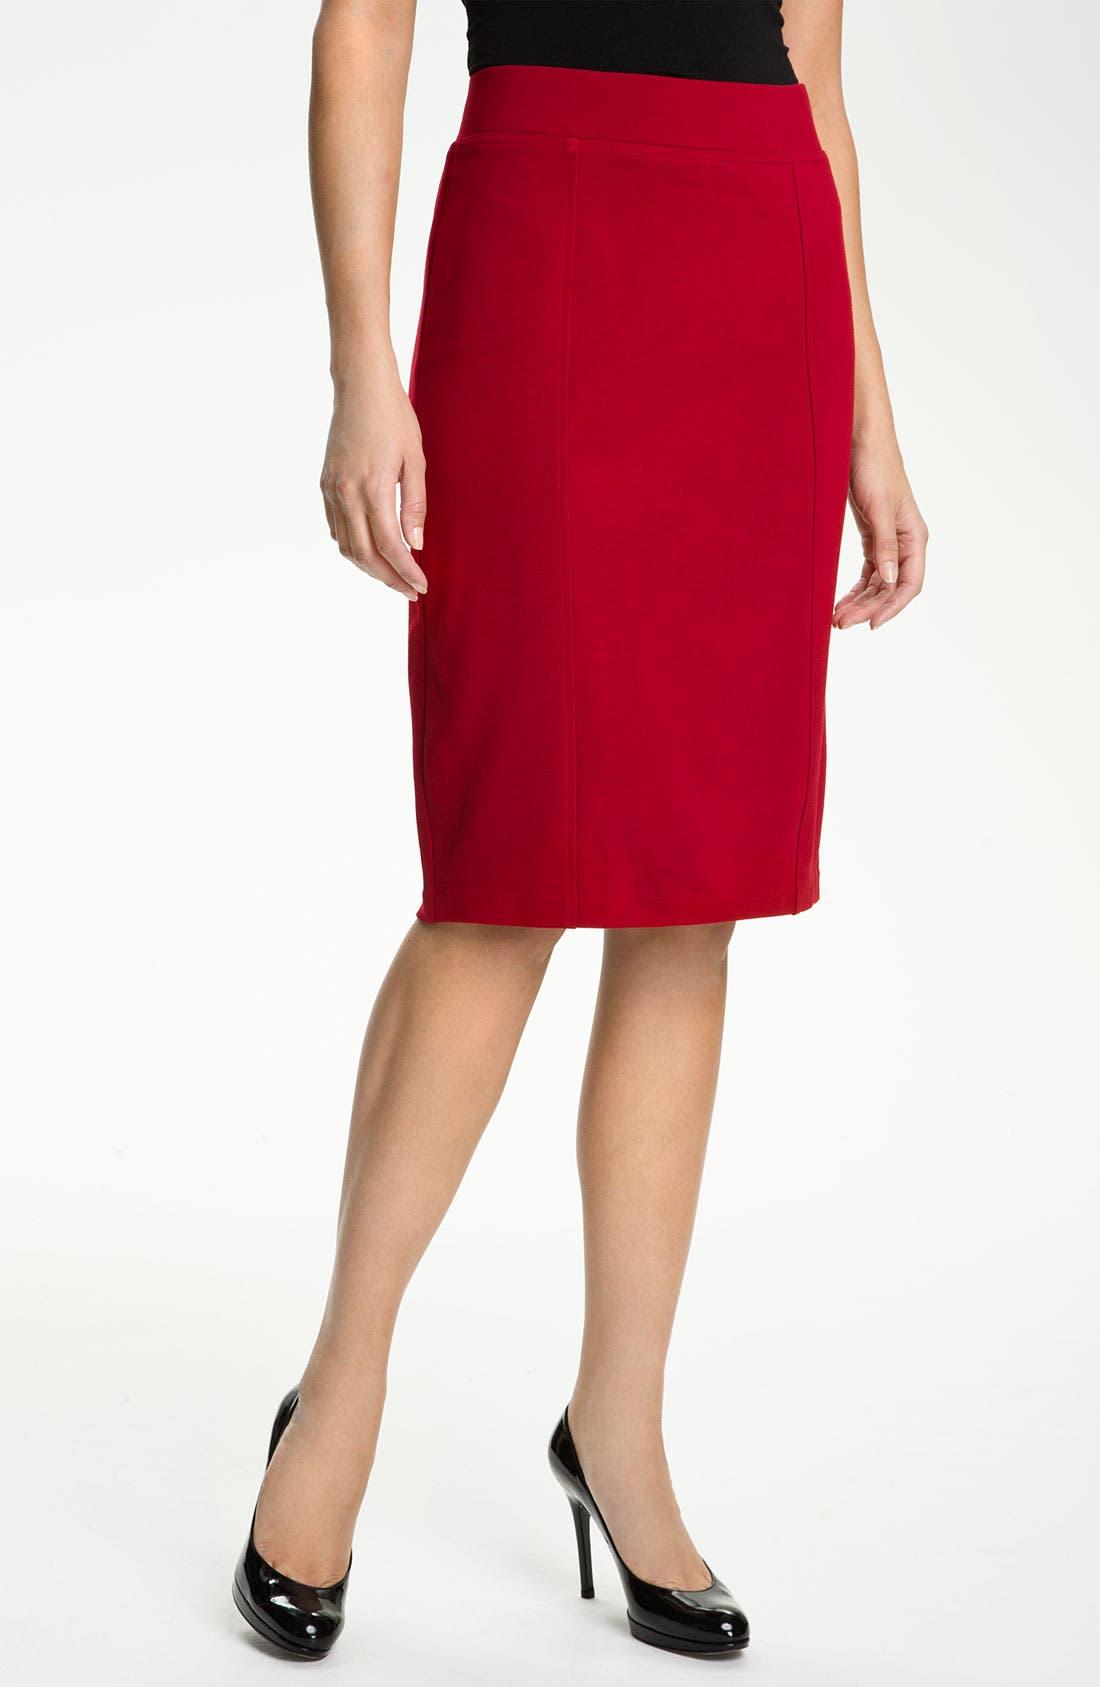 Alternate Image 1 Selected - NYDJ 'Prudence' Ponte Skirt